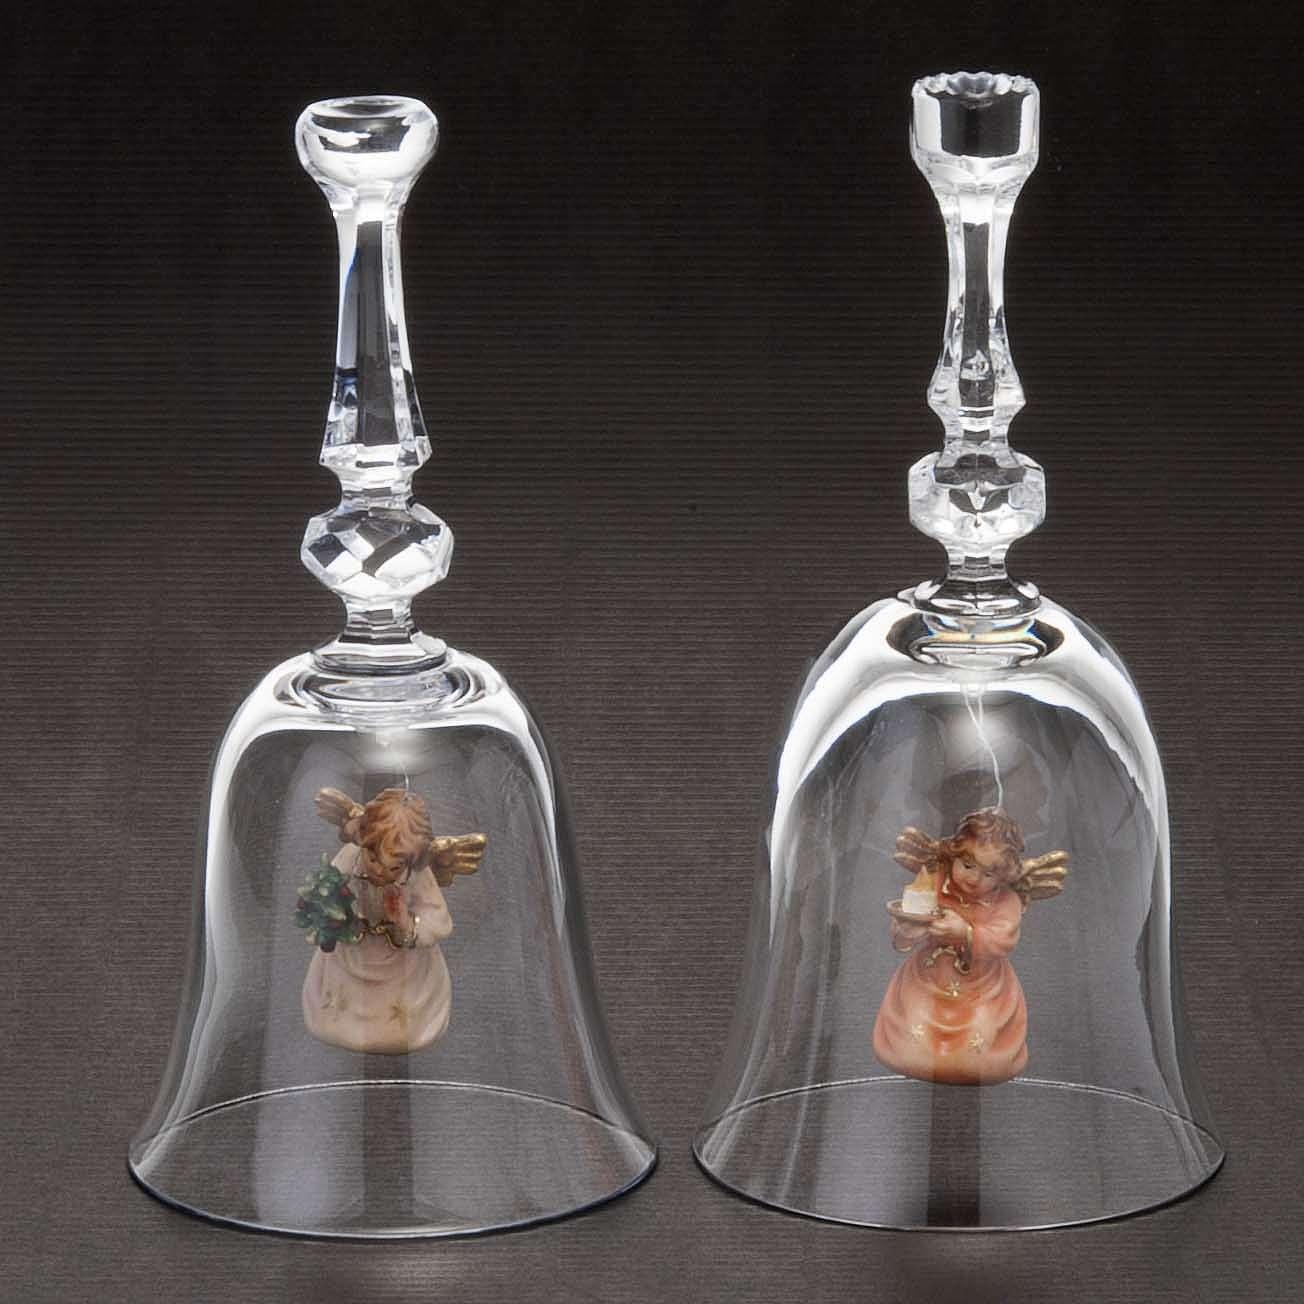 Clochette en cristal avec ange en bois 3